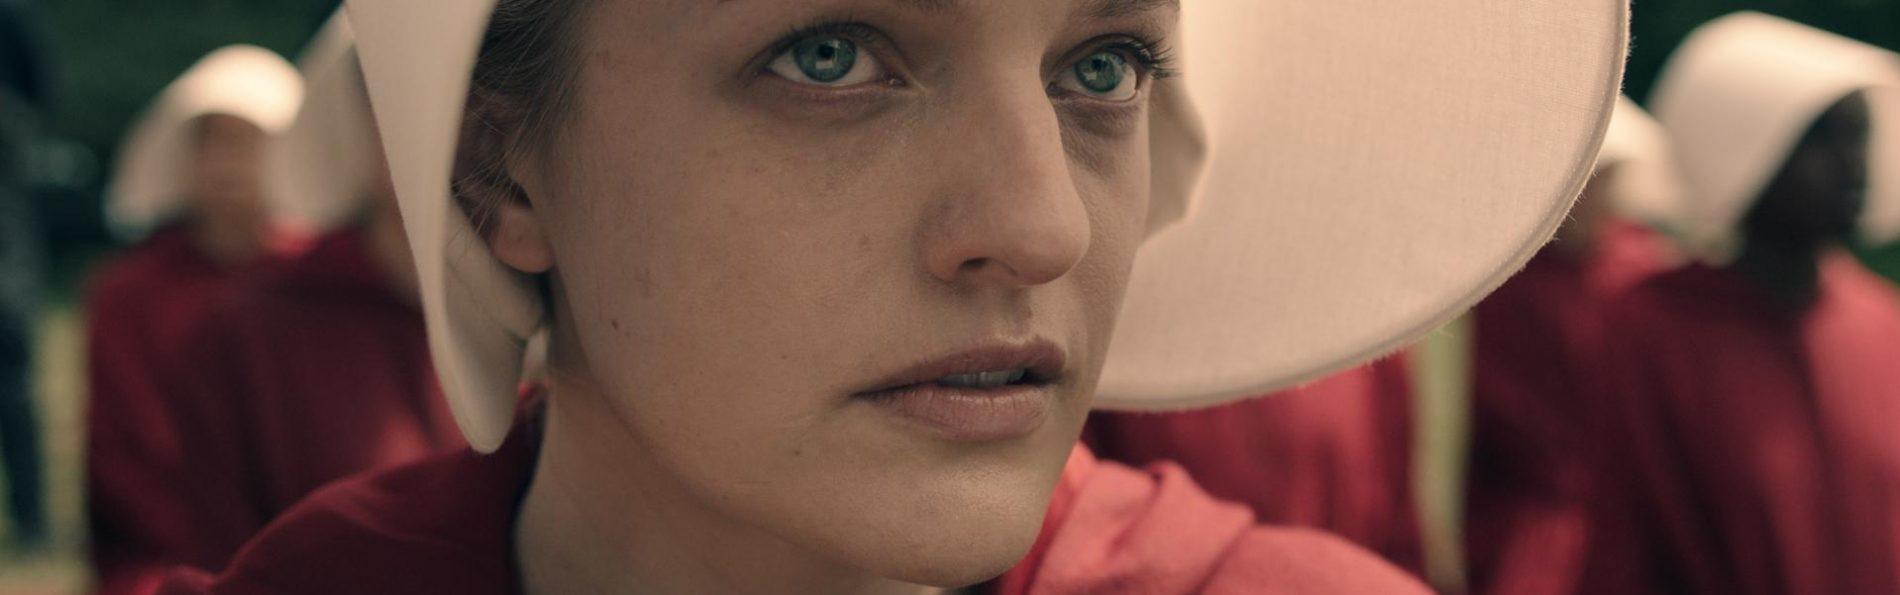 TV Review: The Handmaid's Tale (Season One)